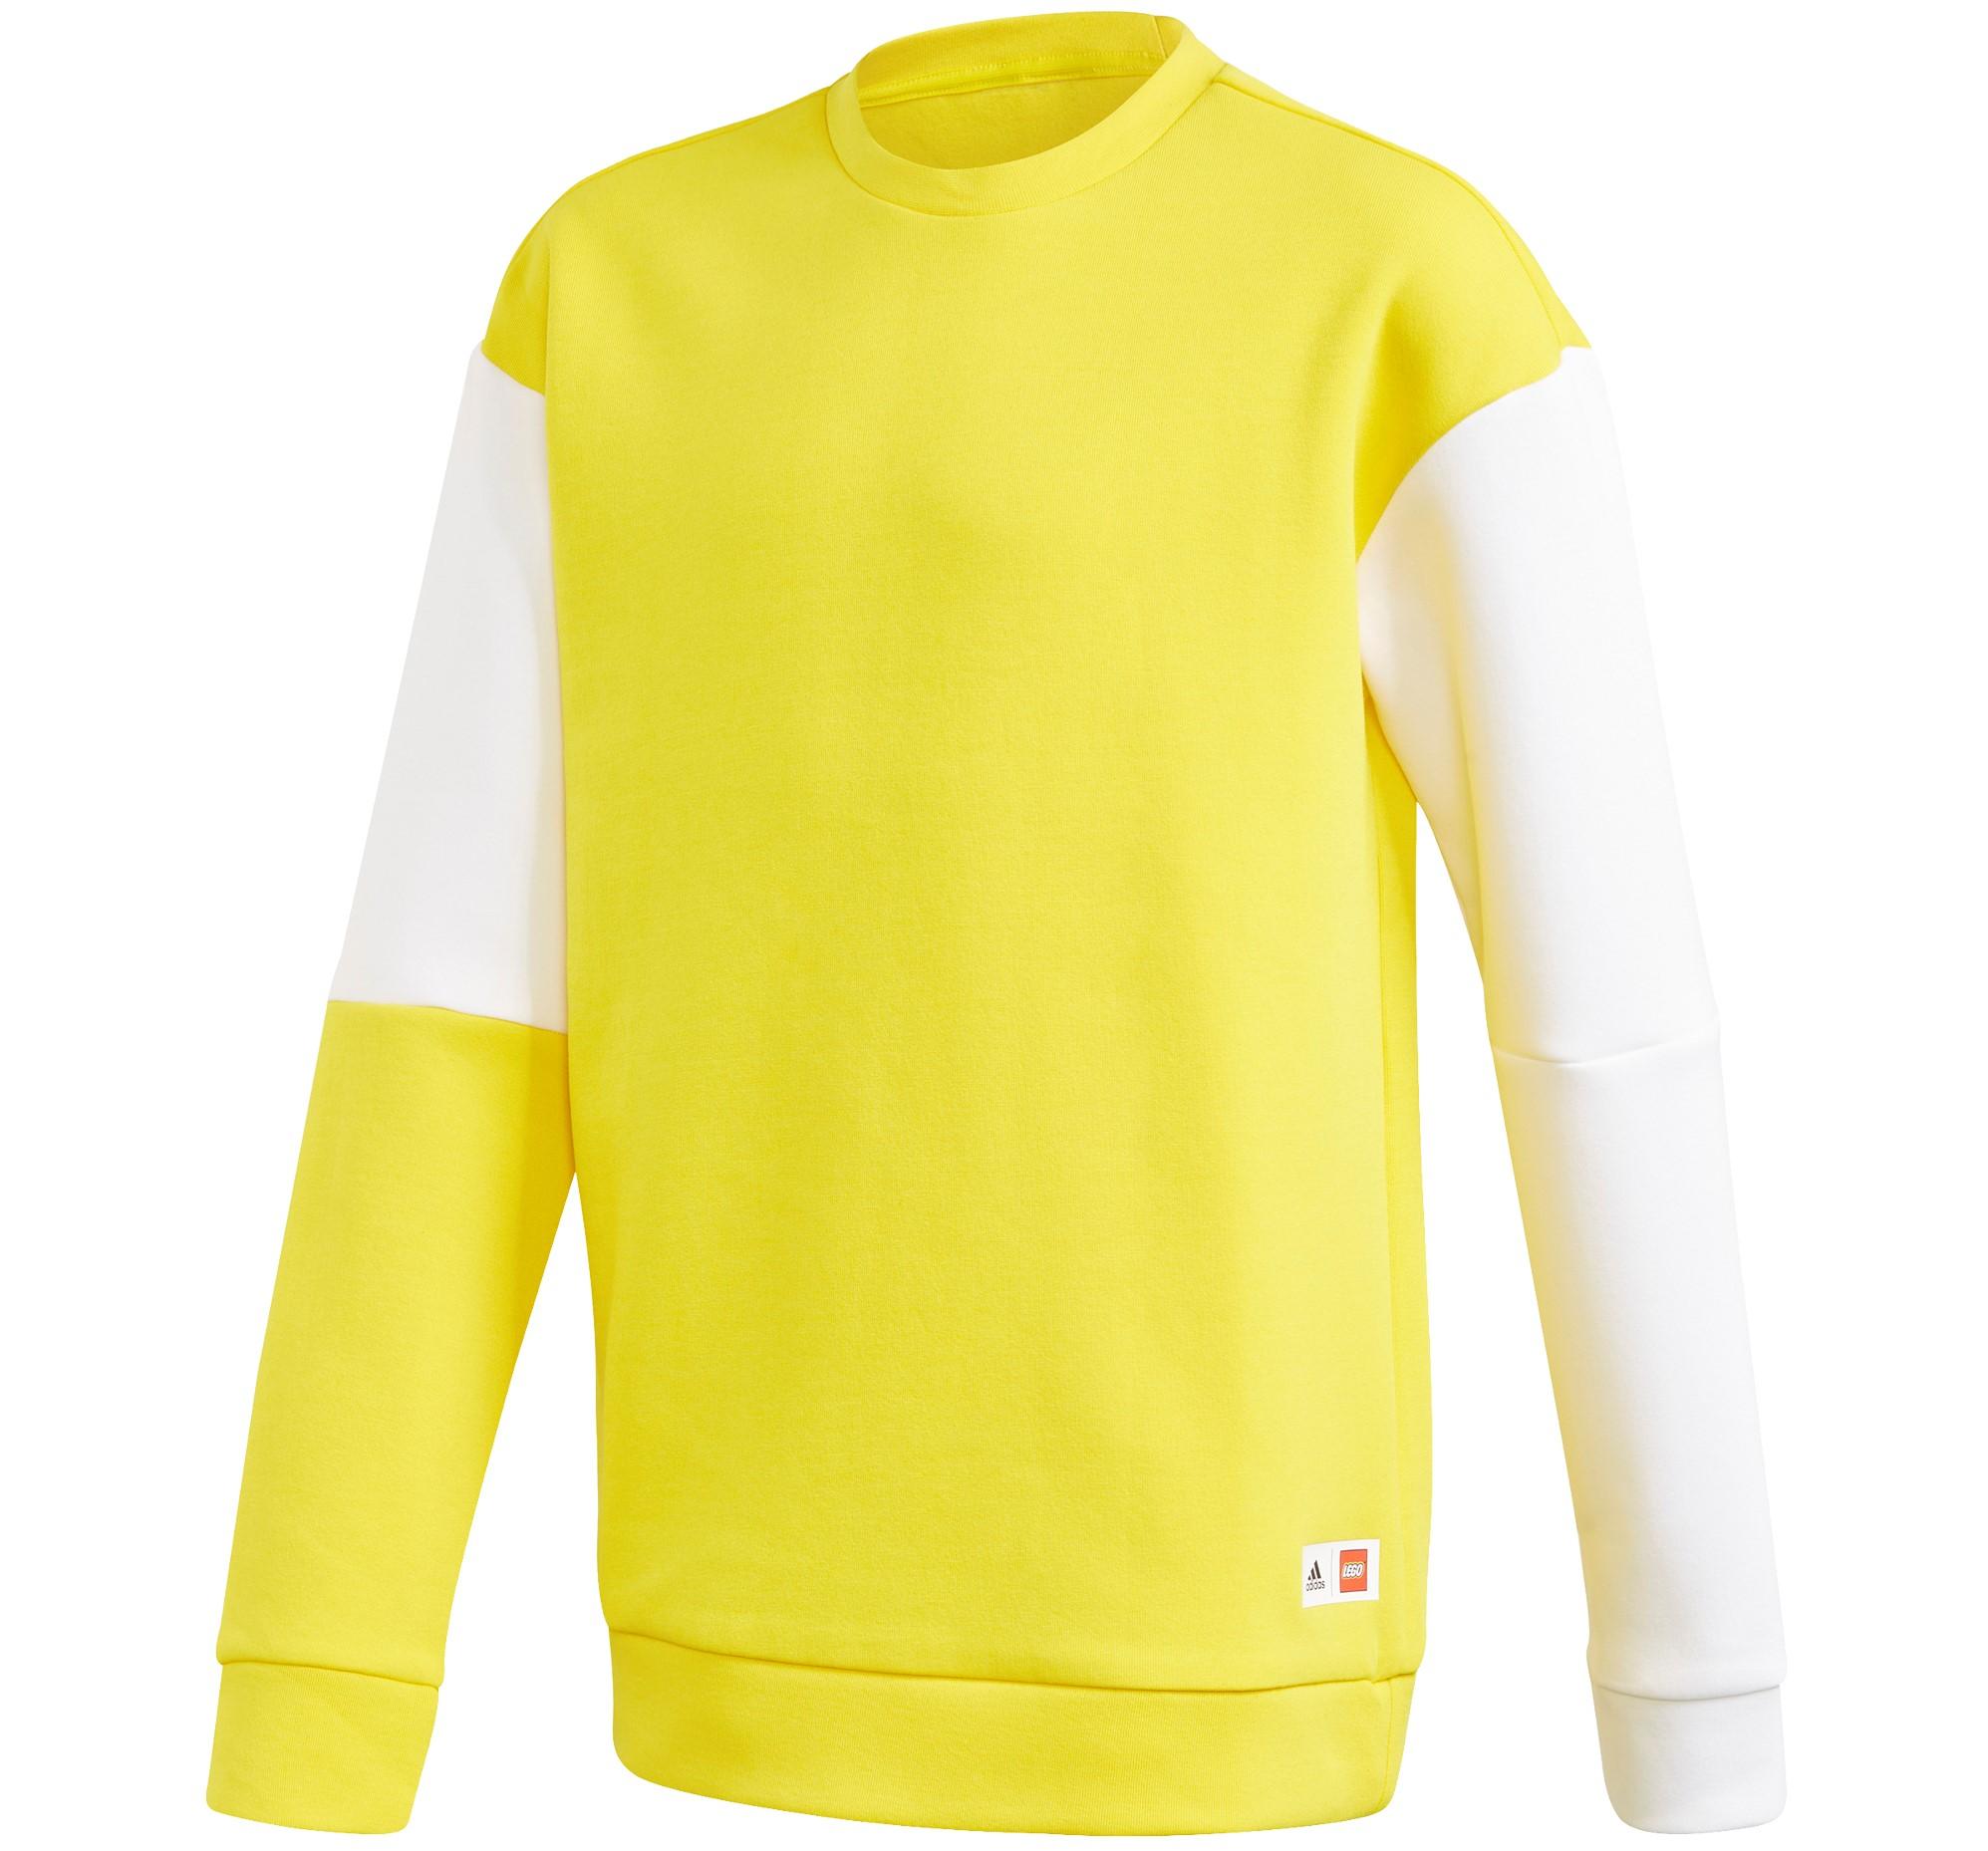 T-SHIRT L//S Lego Wear Baby M/ädchen Sweatshirt 14163 TEA 706